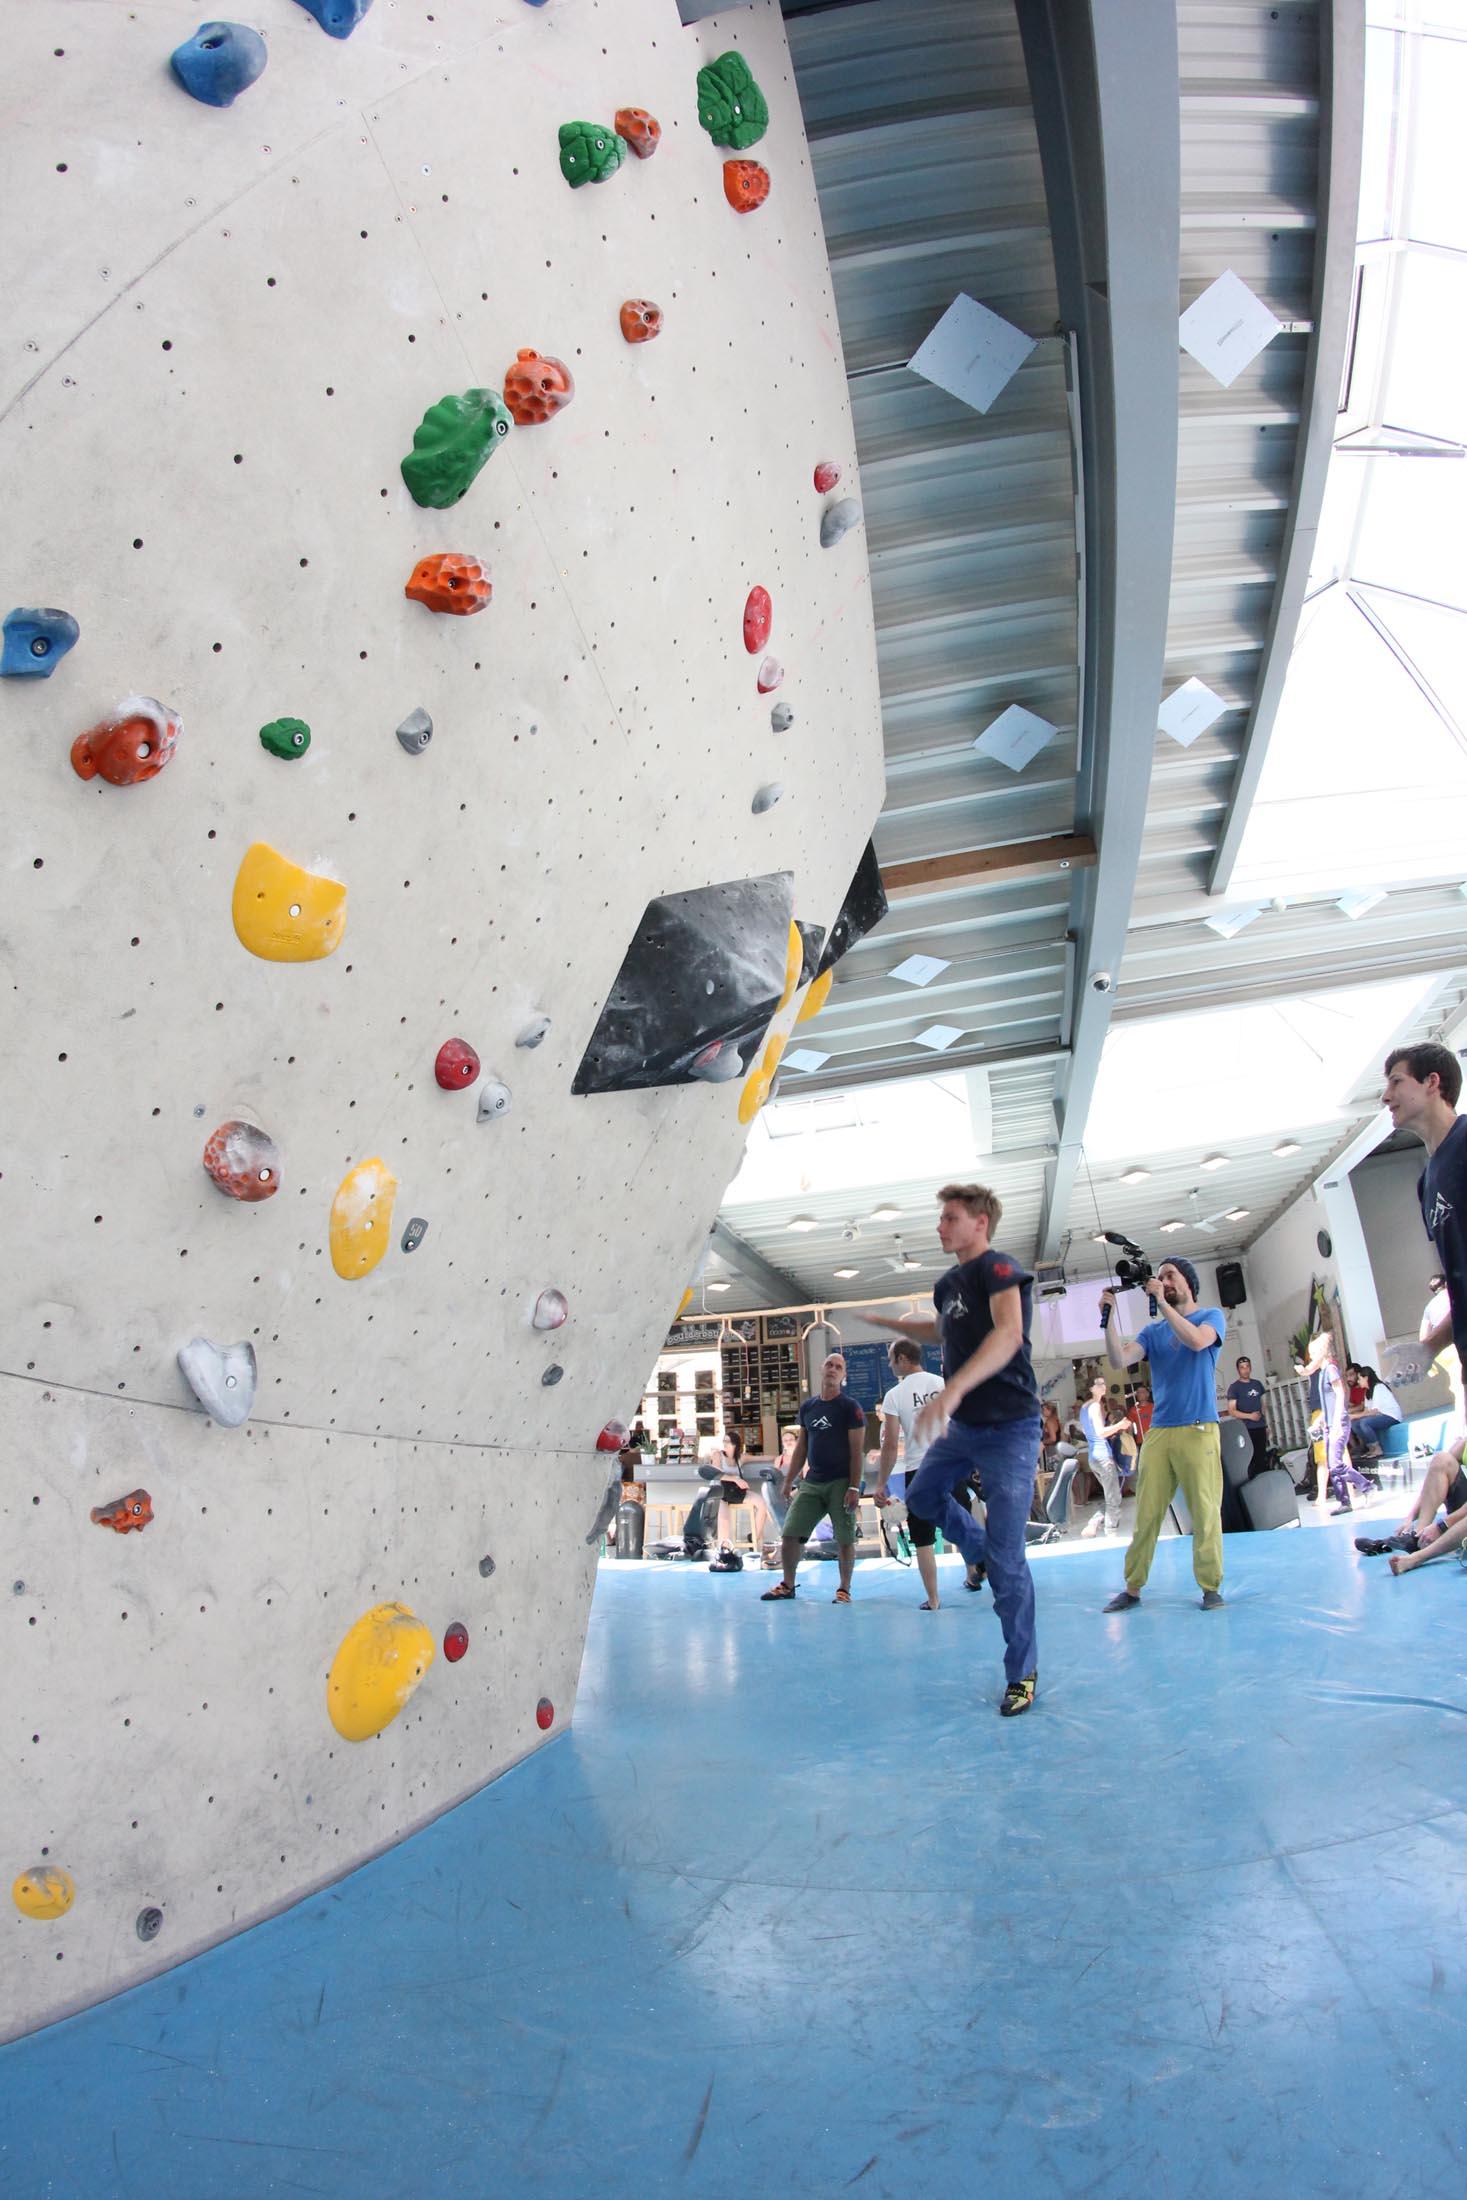 Quali, internationaler bouldercup Frankenjura 2016, BLOCKHELDEN Erlangen, Mammut, Bergfreunde.de, Boulderwettkampf07092016126